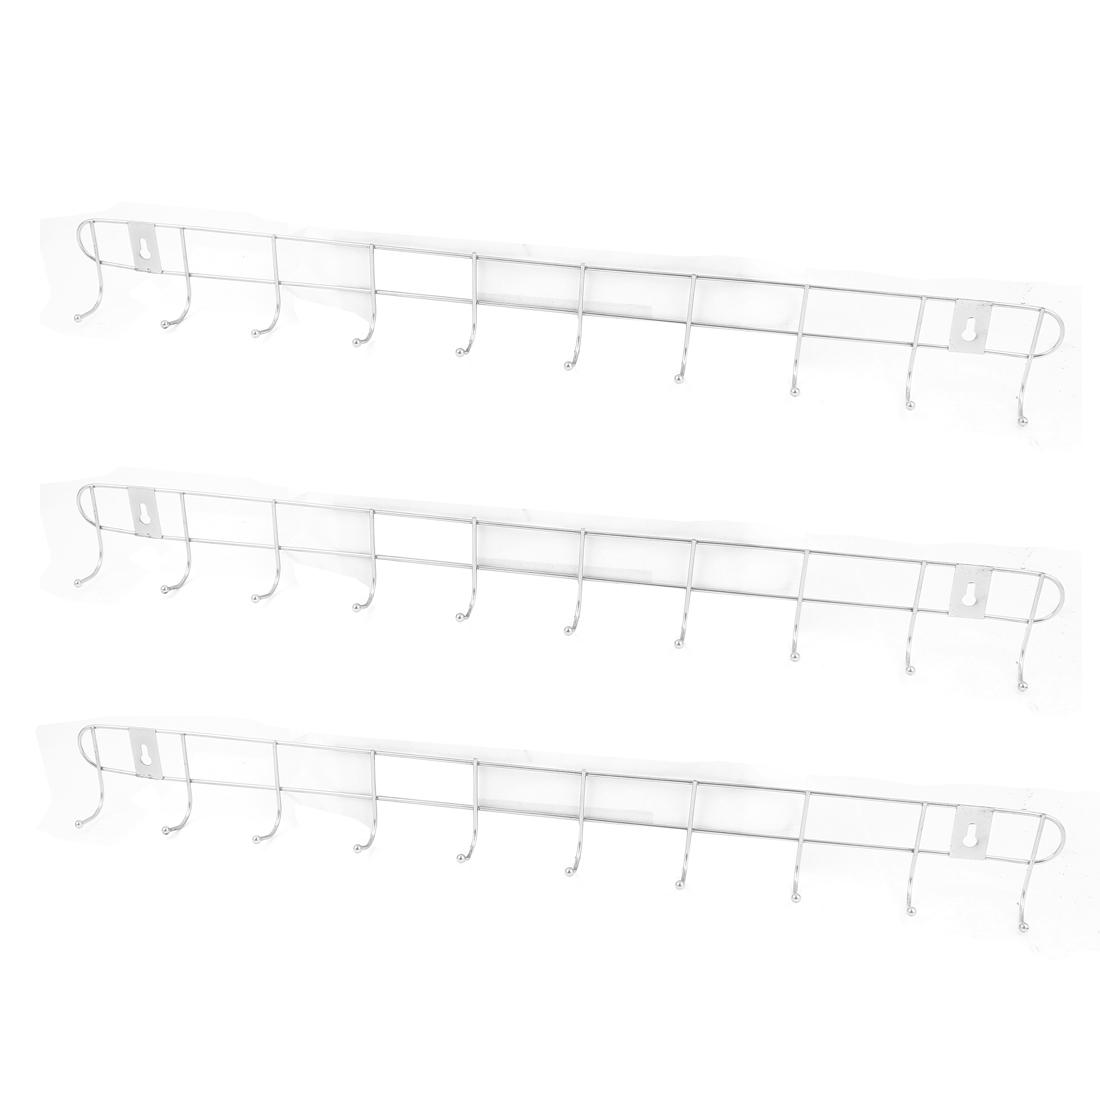 Home Bedroom Bathroom Hat Coat Towel Wall Mounted Metal 10 Hooks Hanger Rack Holder 3PCS